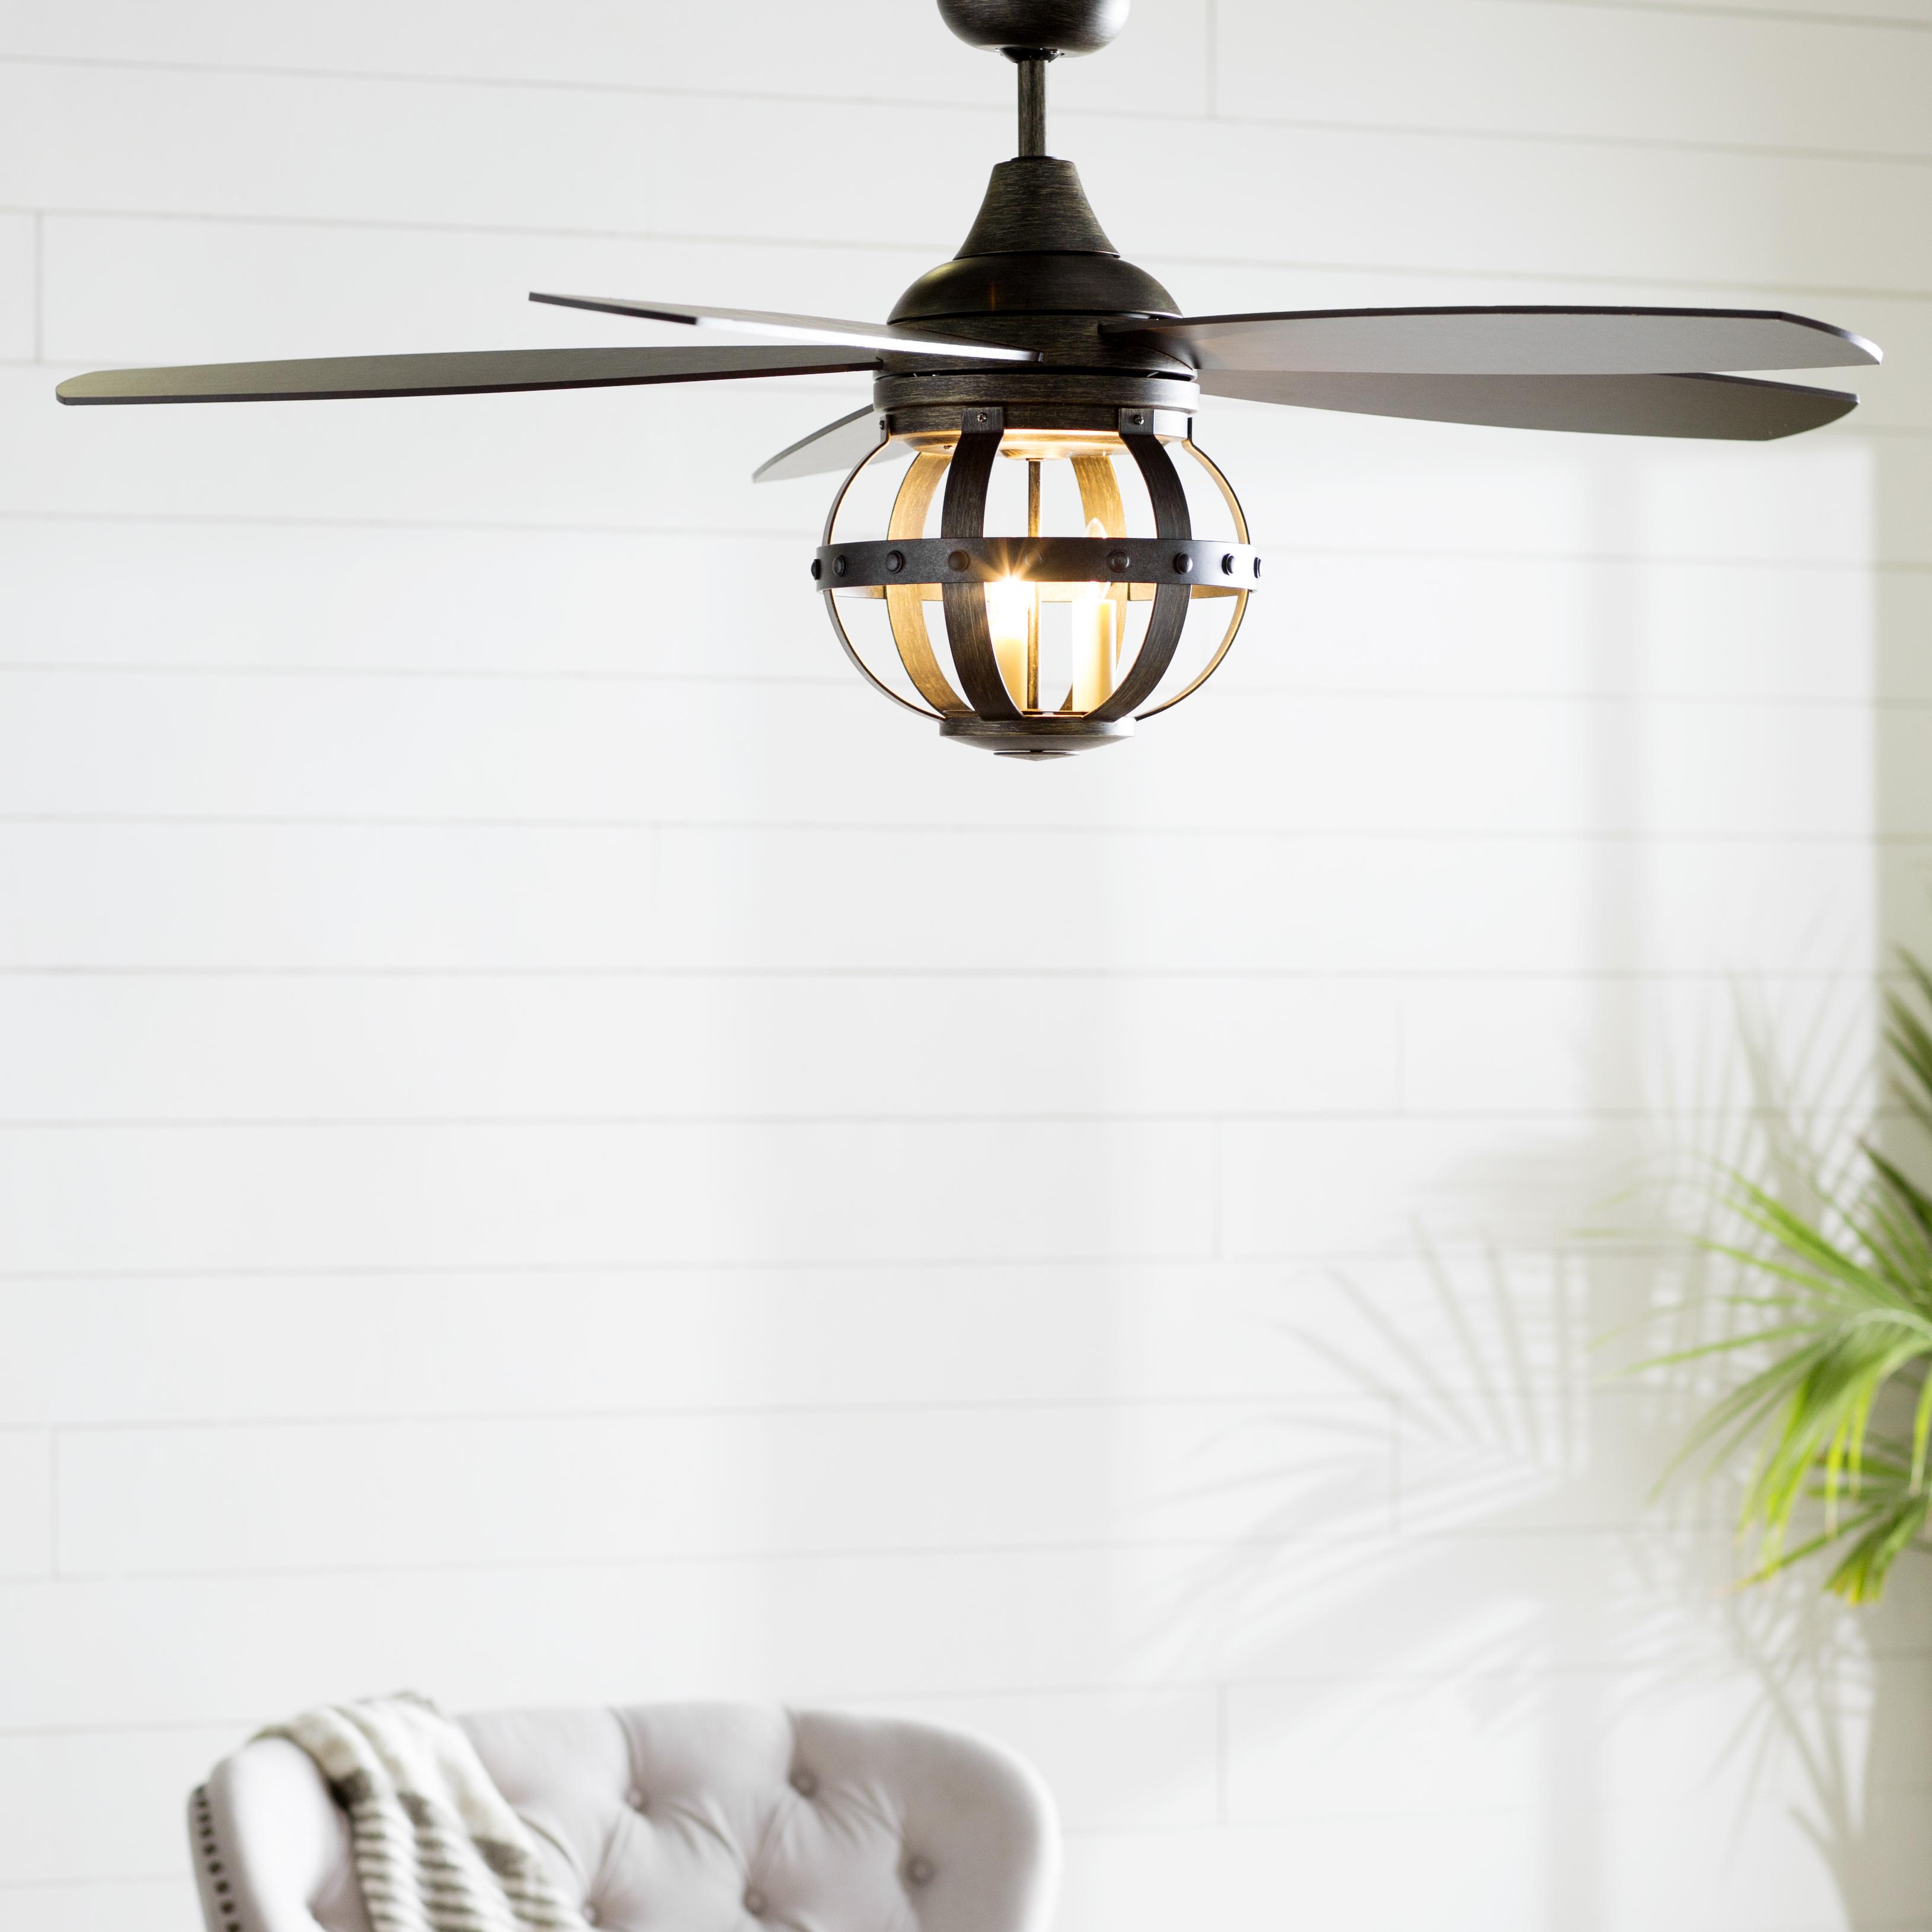 Lighting | Joss & Main on painting bedroom ceilings, diy bedroom ceilings, decorating bedroom shelves, master bedroom ceilings, decorating bedroom walls, decorating bedroom furniture,